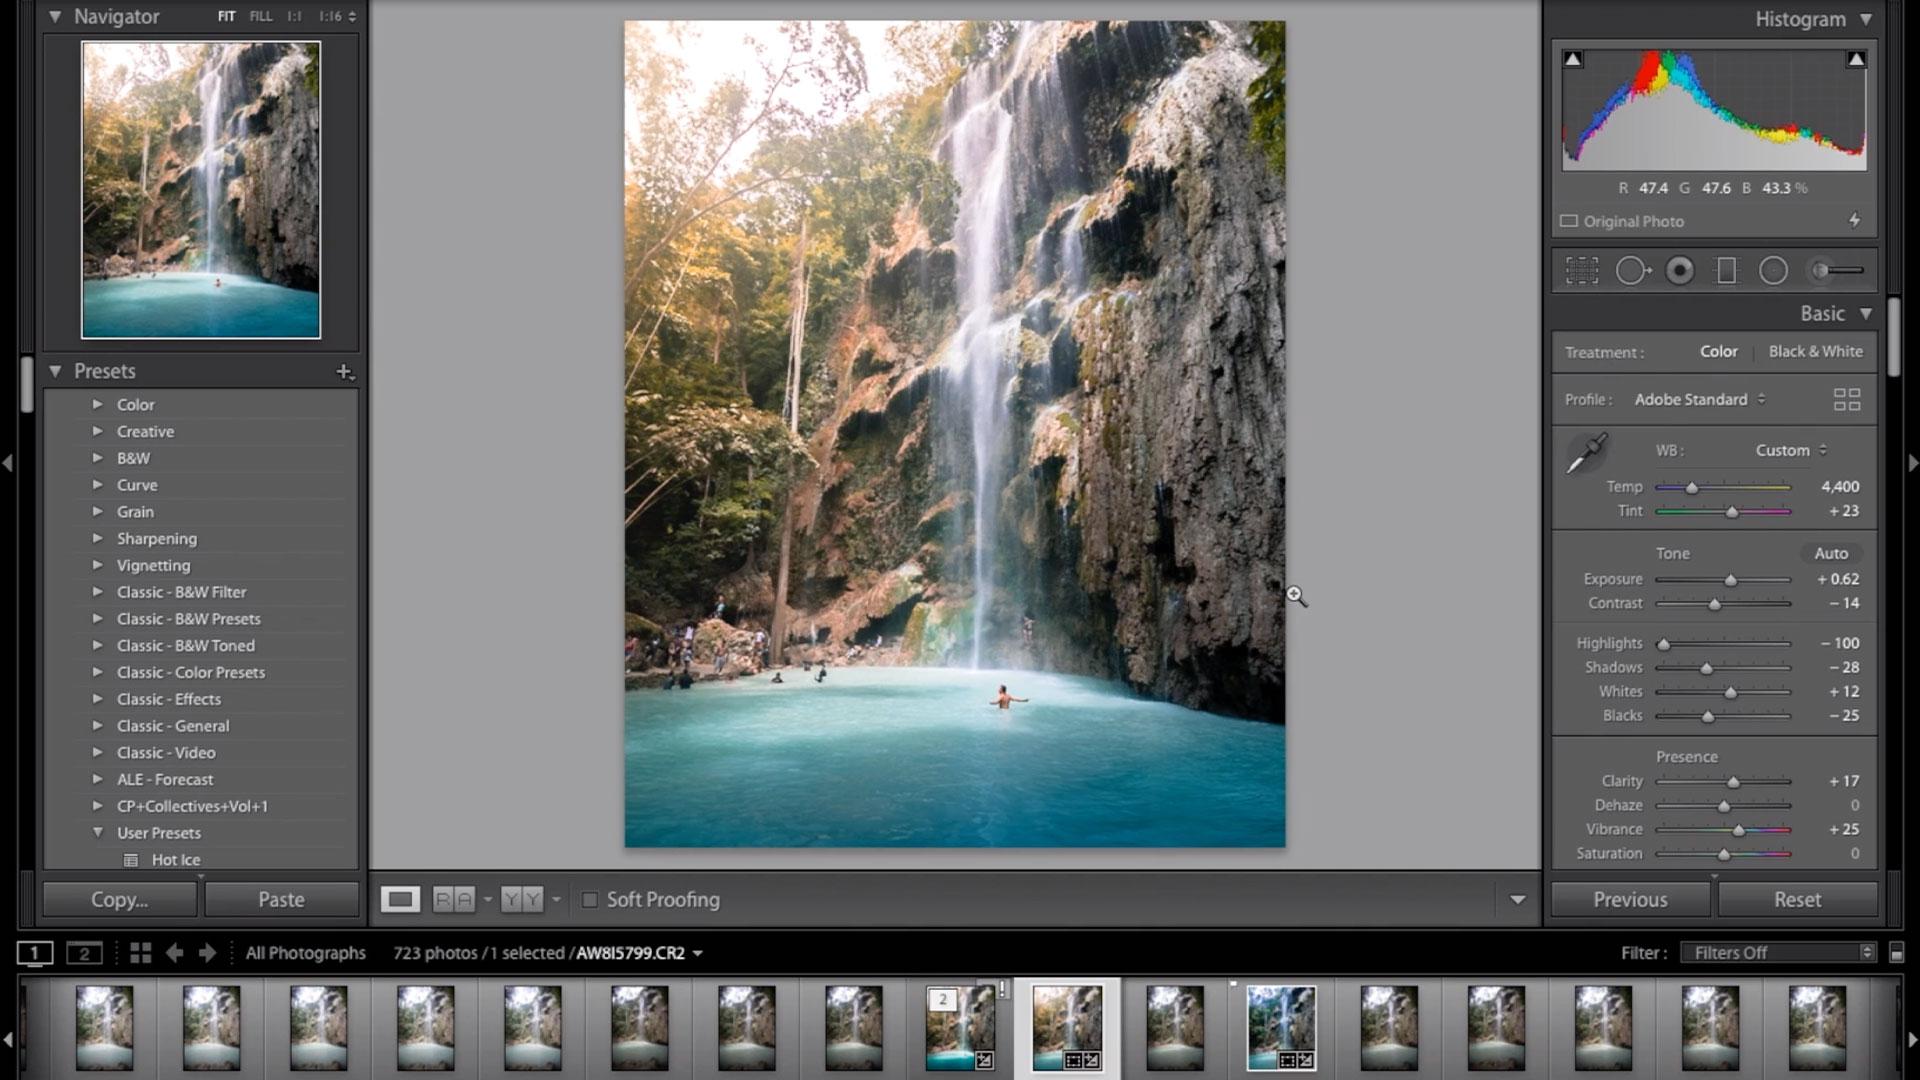 viewbug-waterfall-featured2